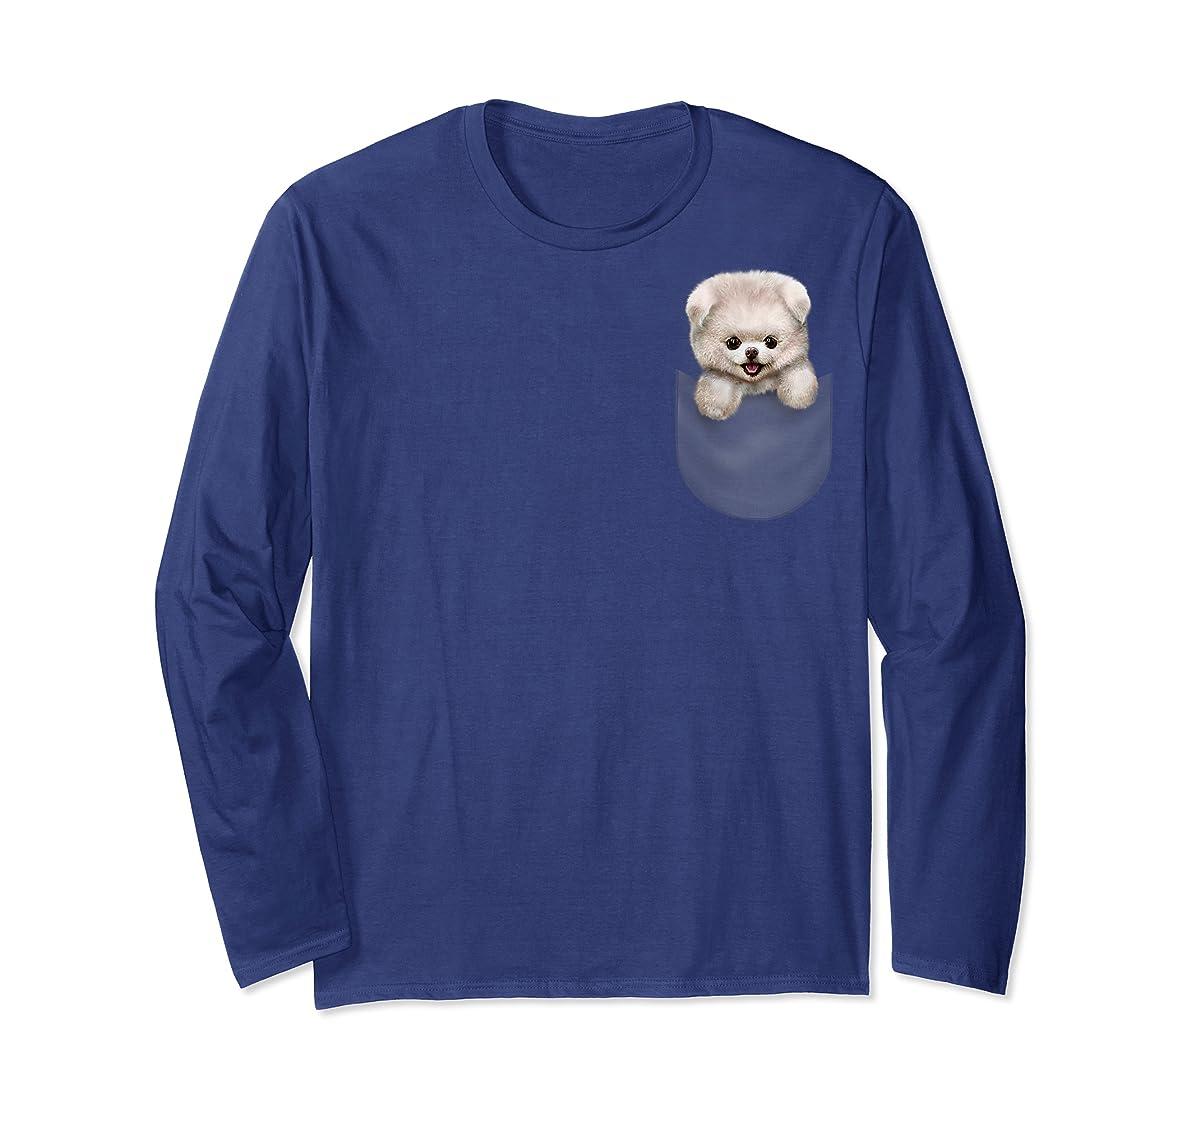 T-Shirt, Cute White Fluffy Pomeranian Puppy in Pocket, Dog-Long Sleeve-Navy